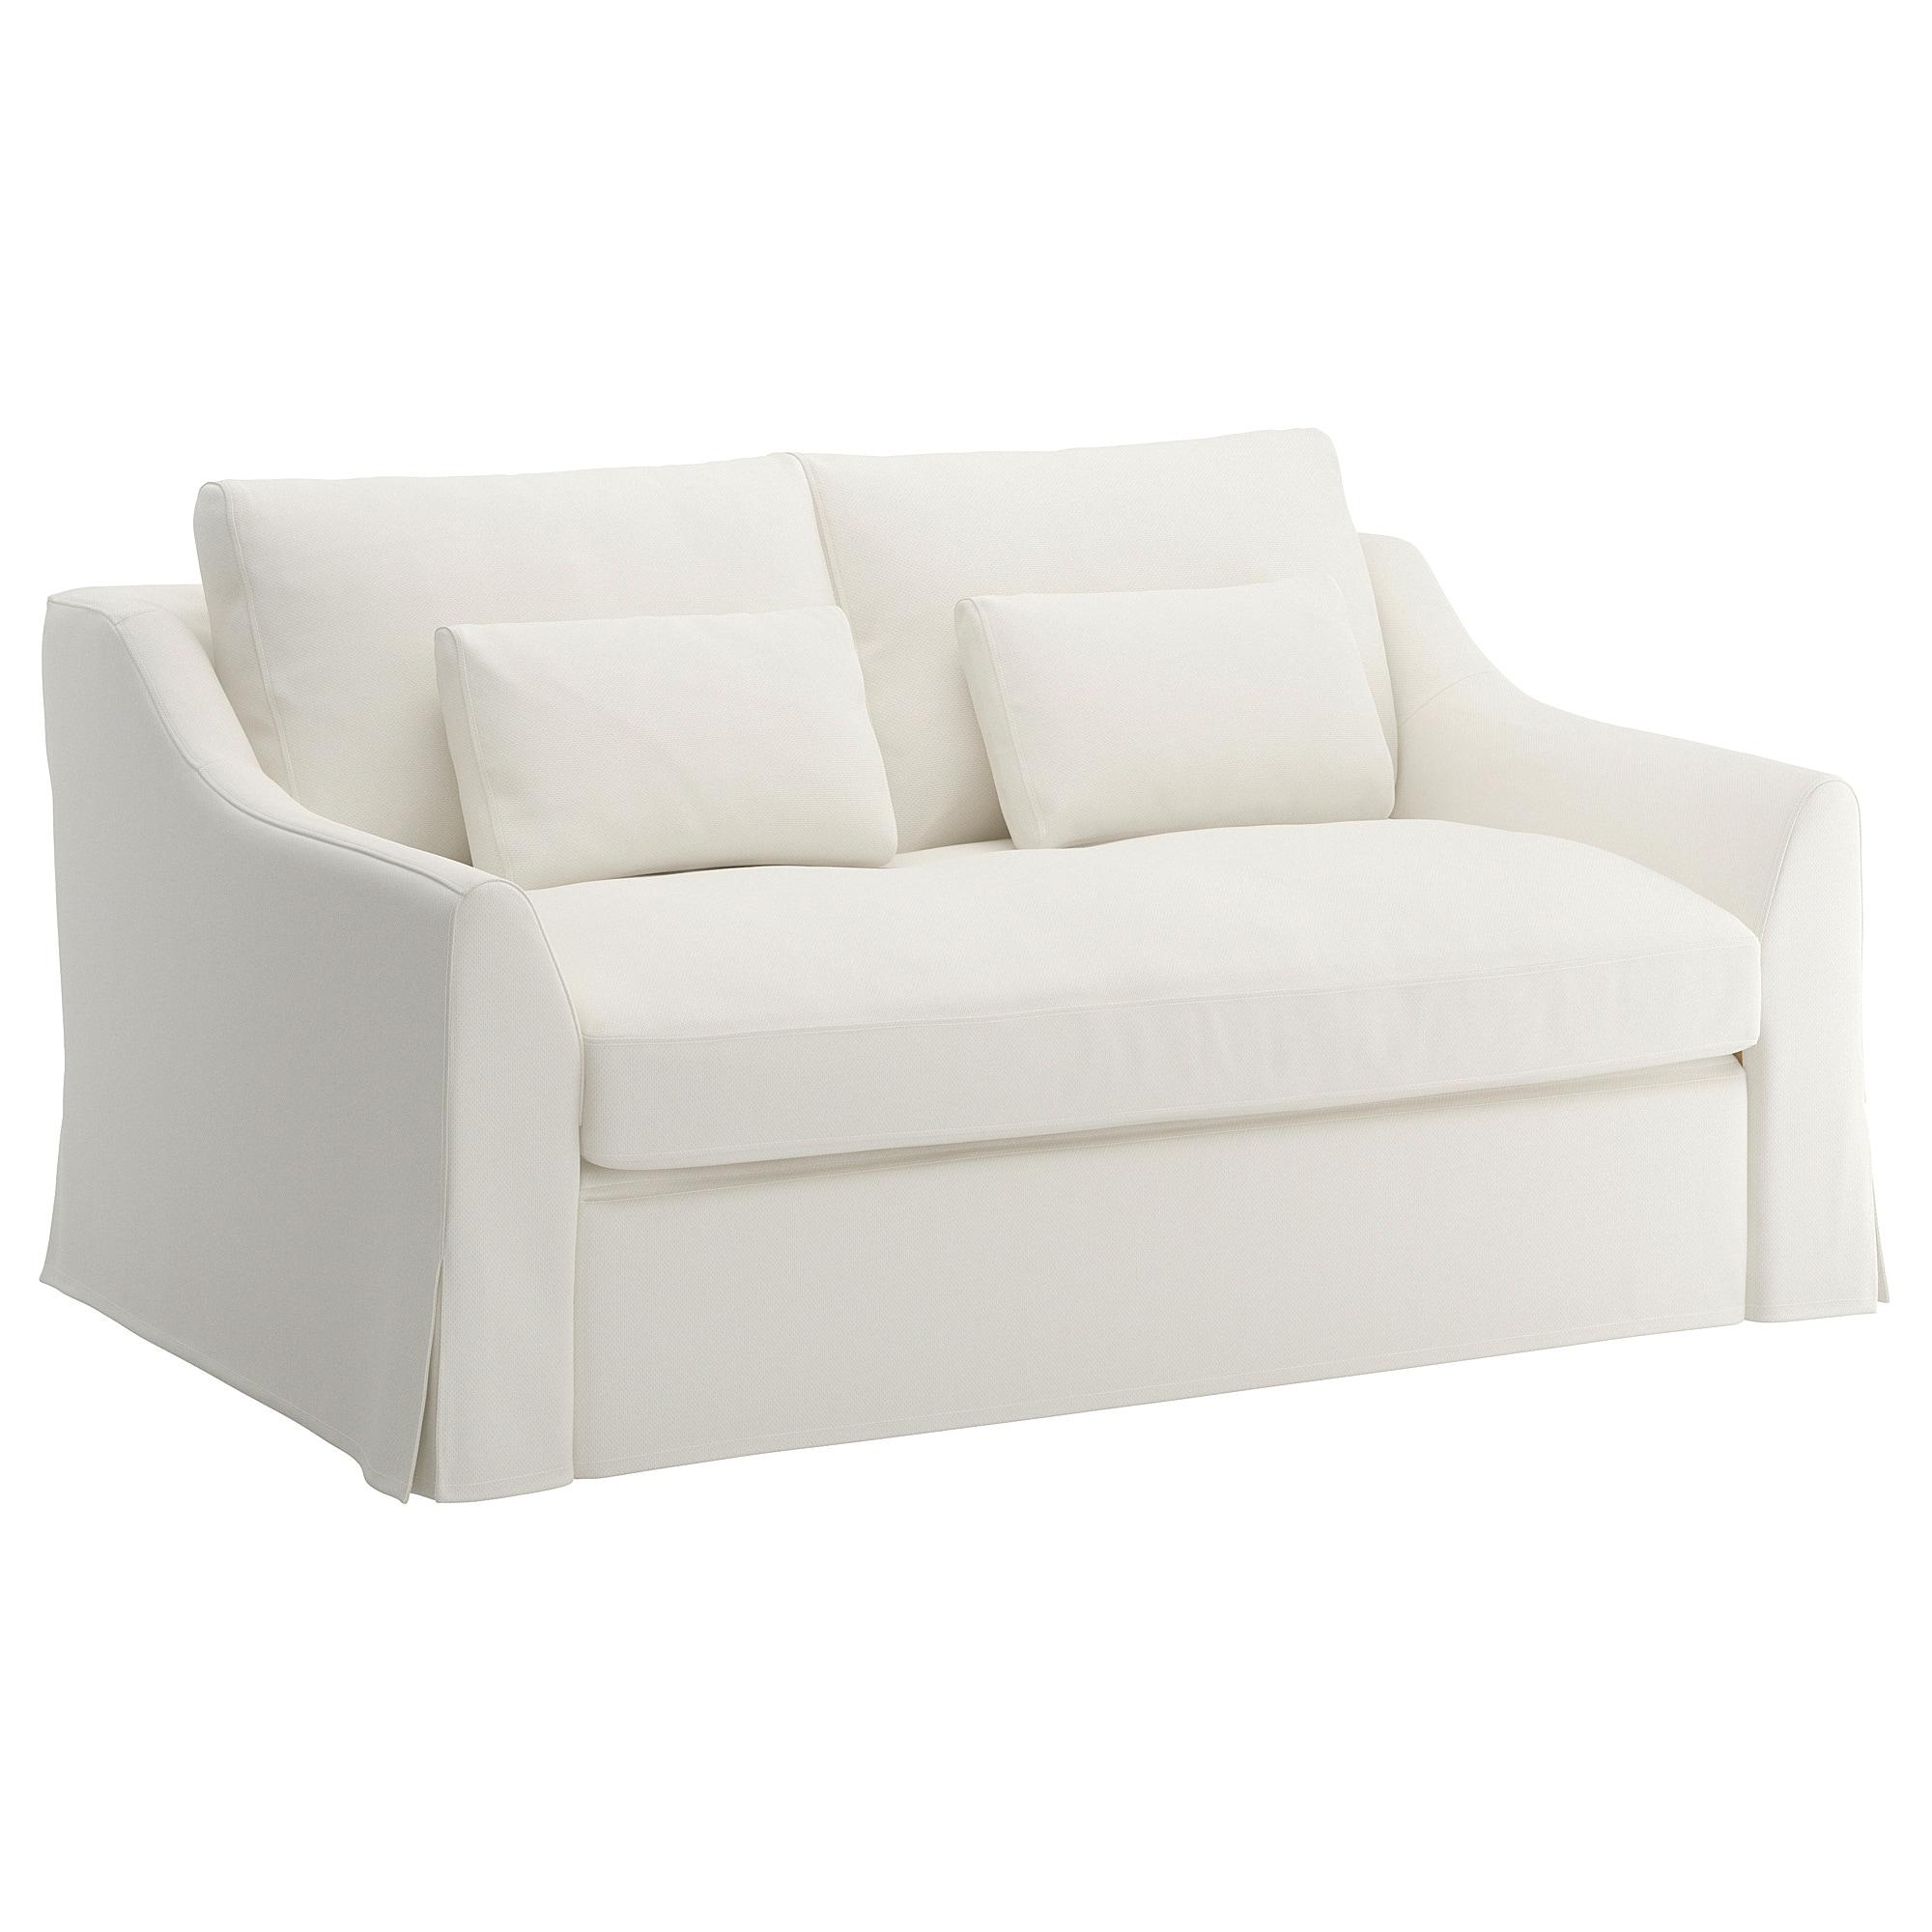 Ikea sofas Cama Ipdd Fà Rlà V sofà Cama 2 Flodafors Blanco Ikea